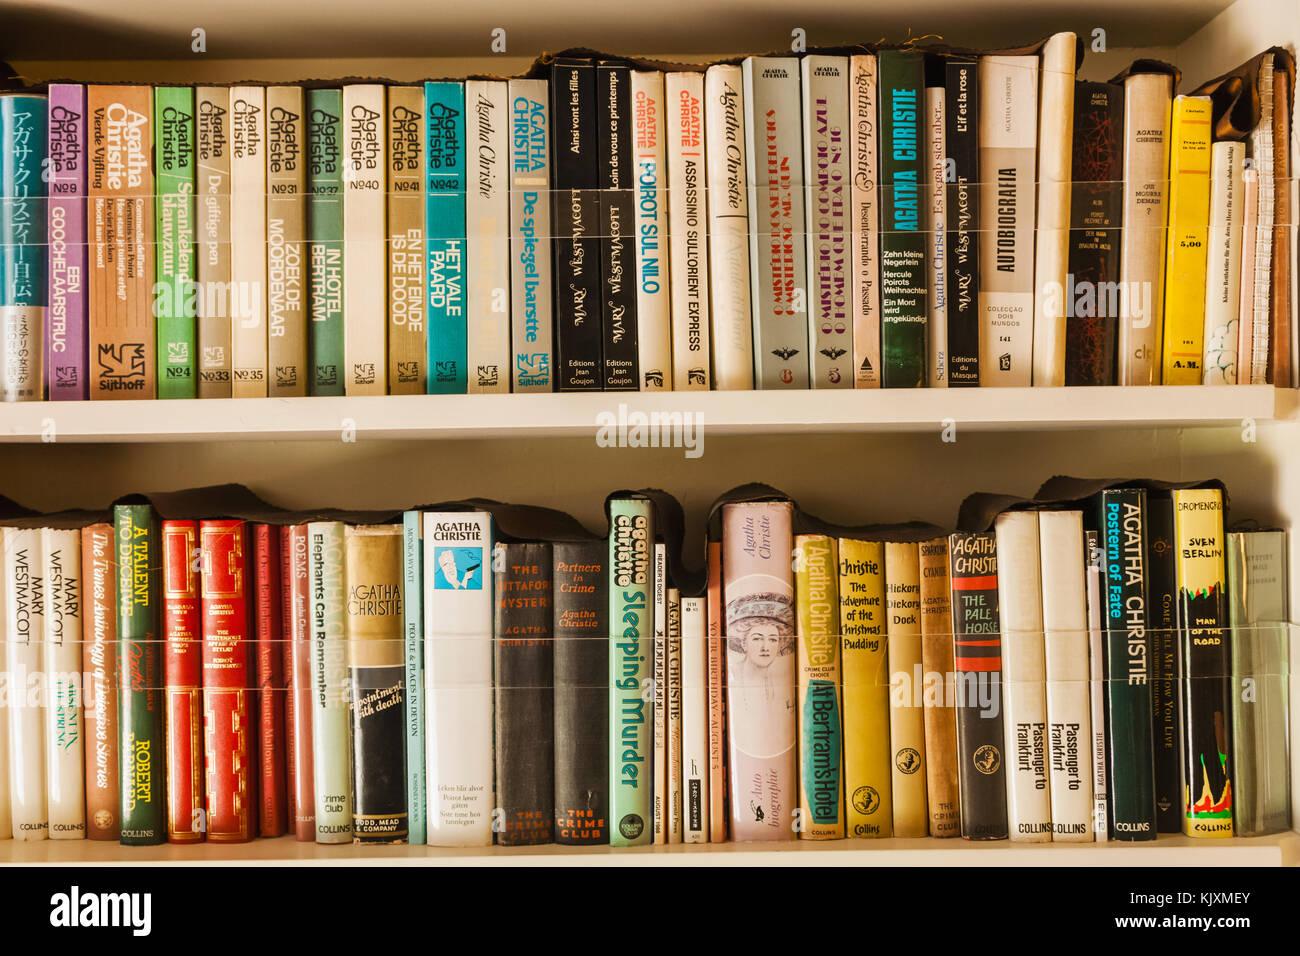 Agatha christie books immagini agatha christie books fotos stock